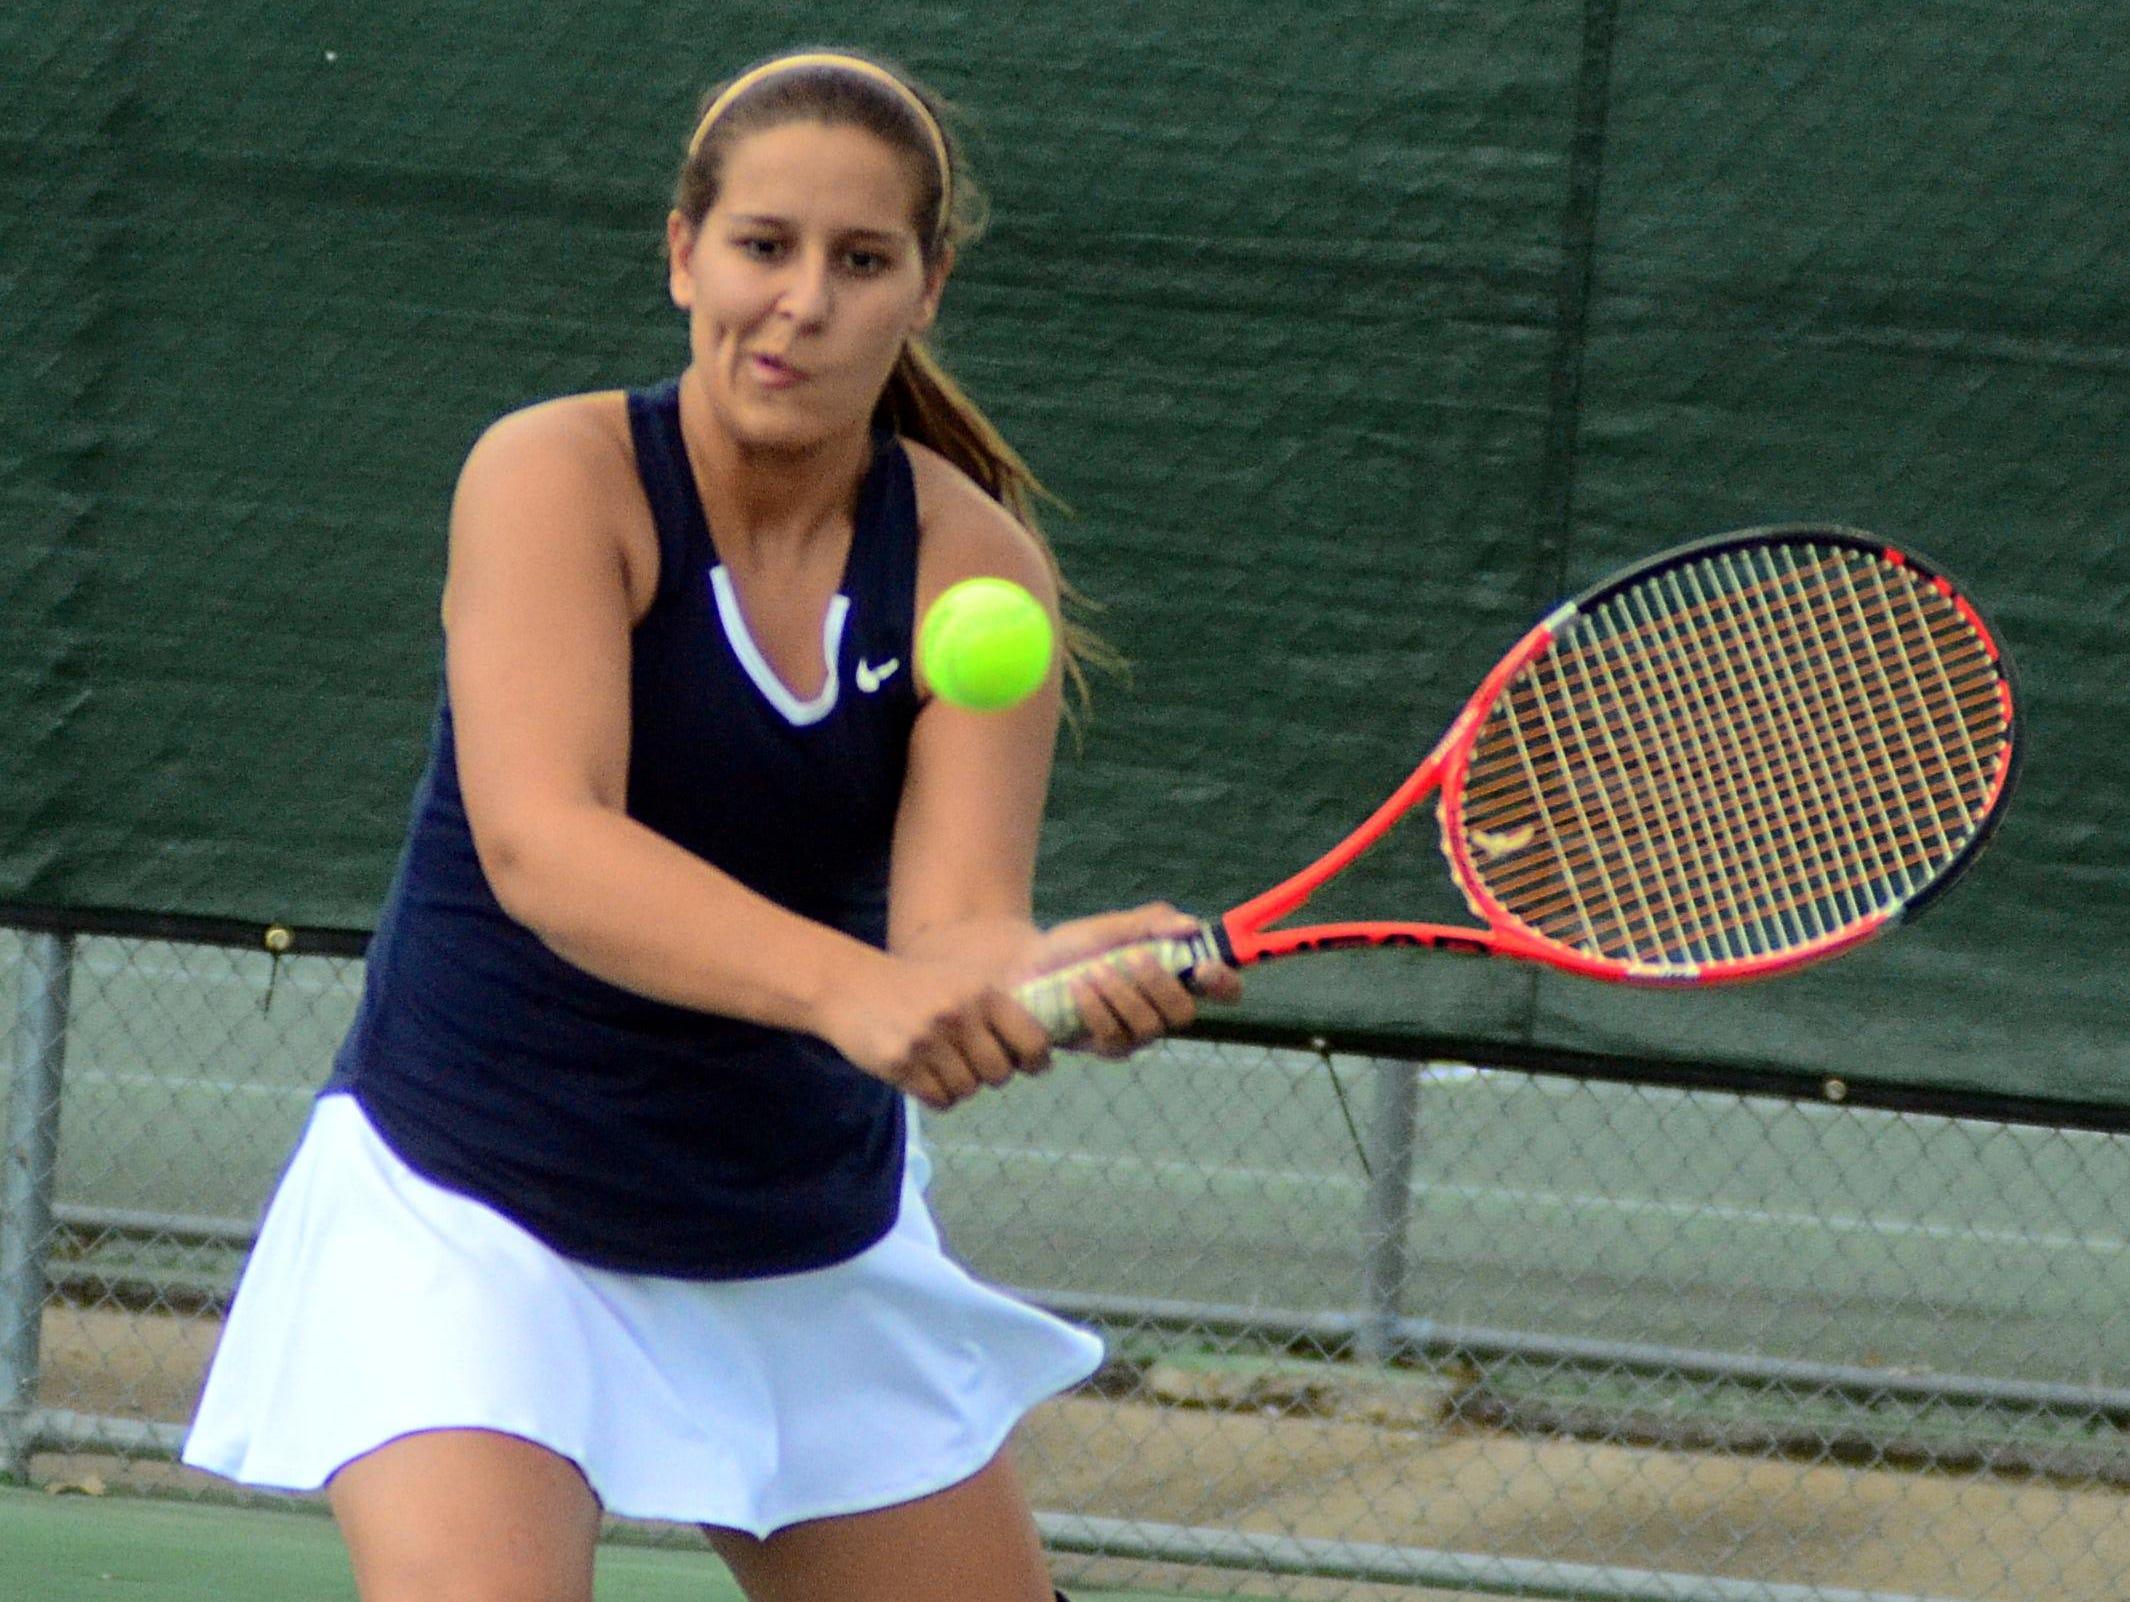 Beech High senior Courtney Brooks returns a serve during Wednesday's doubles semifinals.